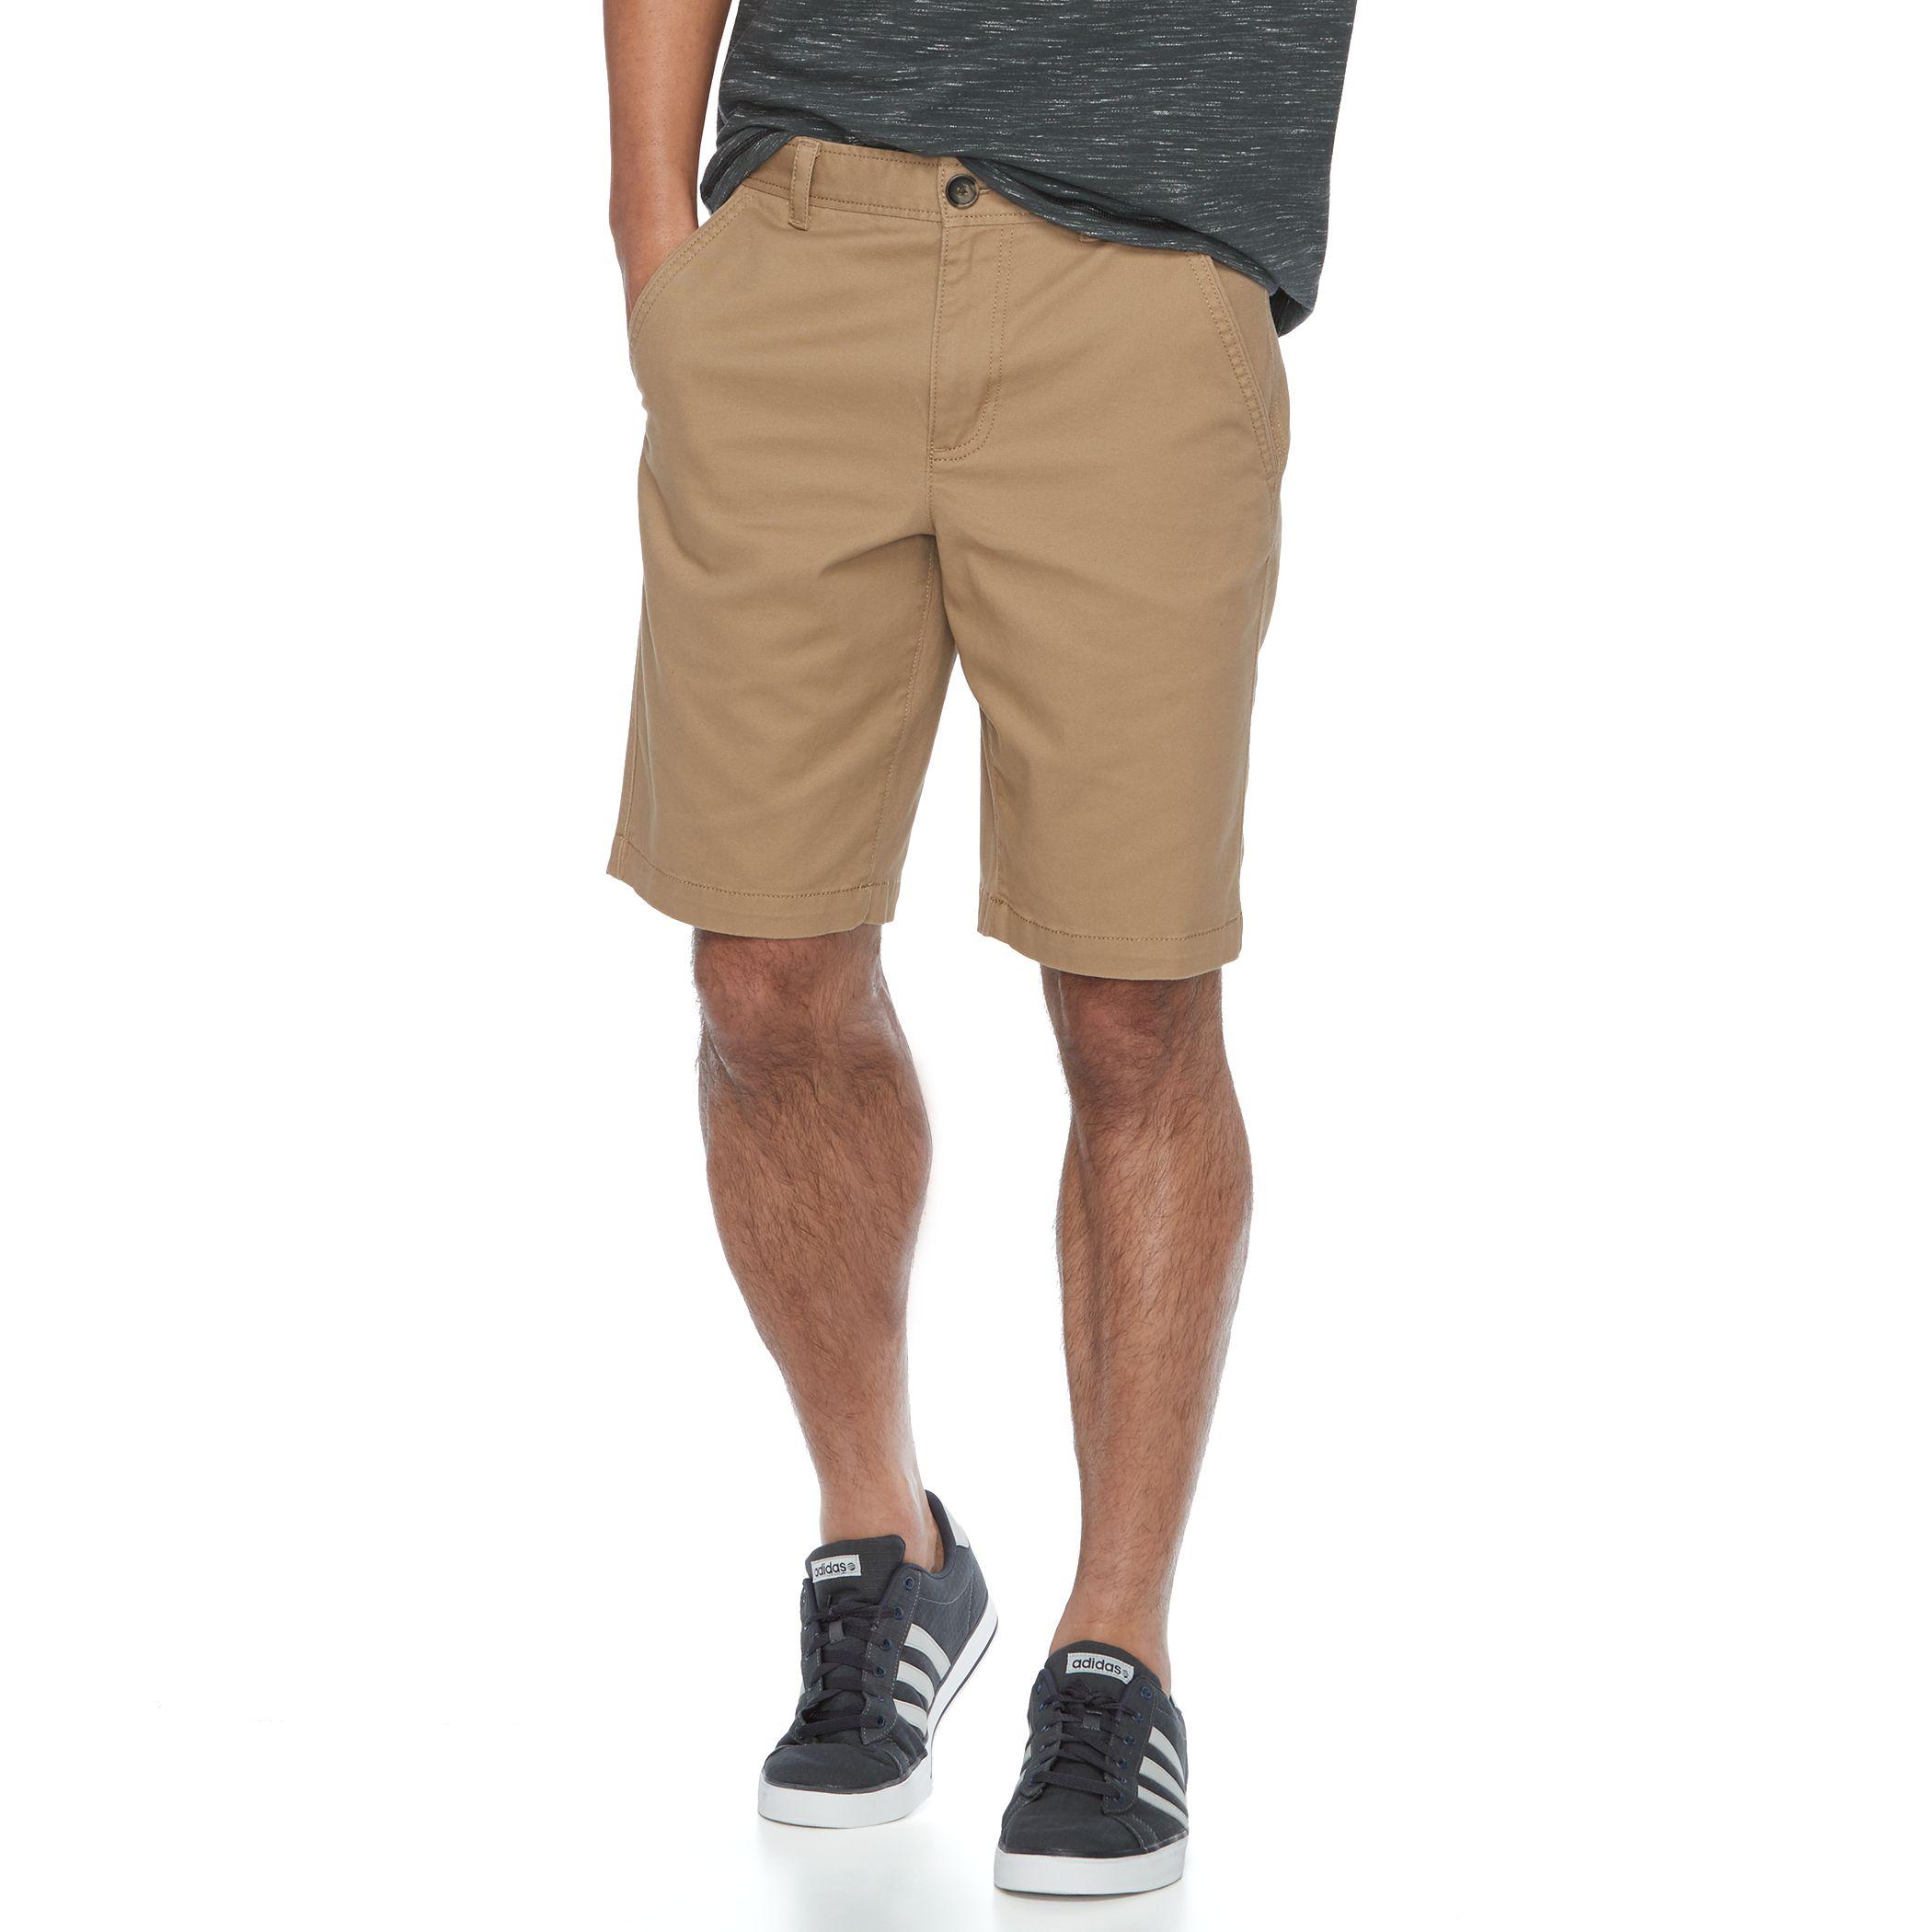 Kohls Khaki Shorts